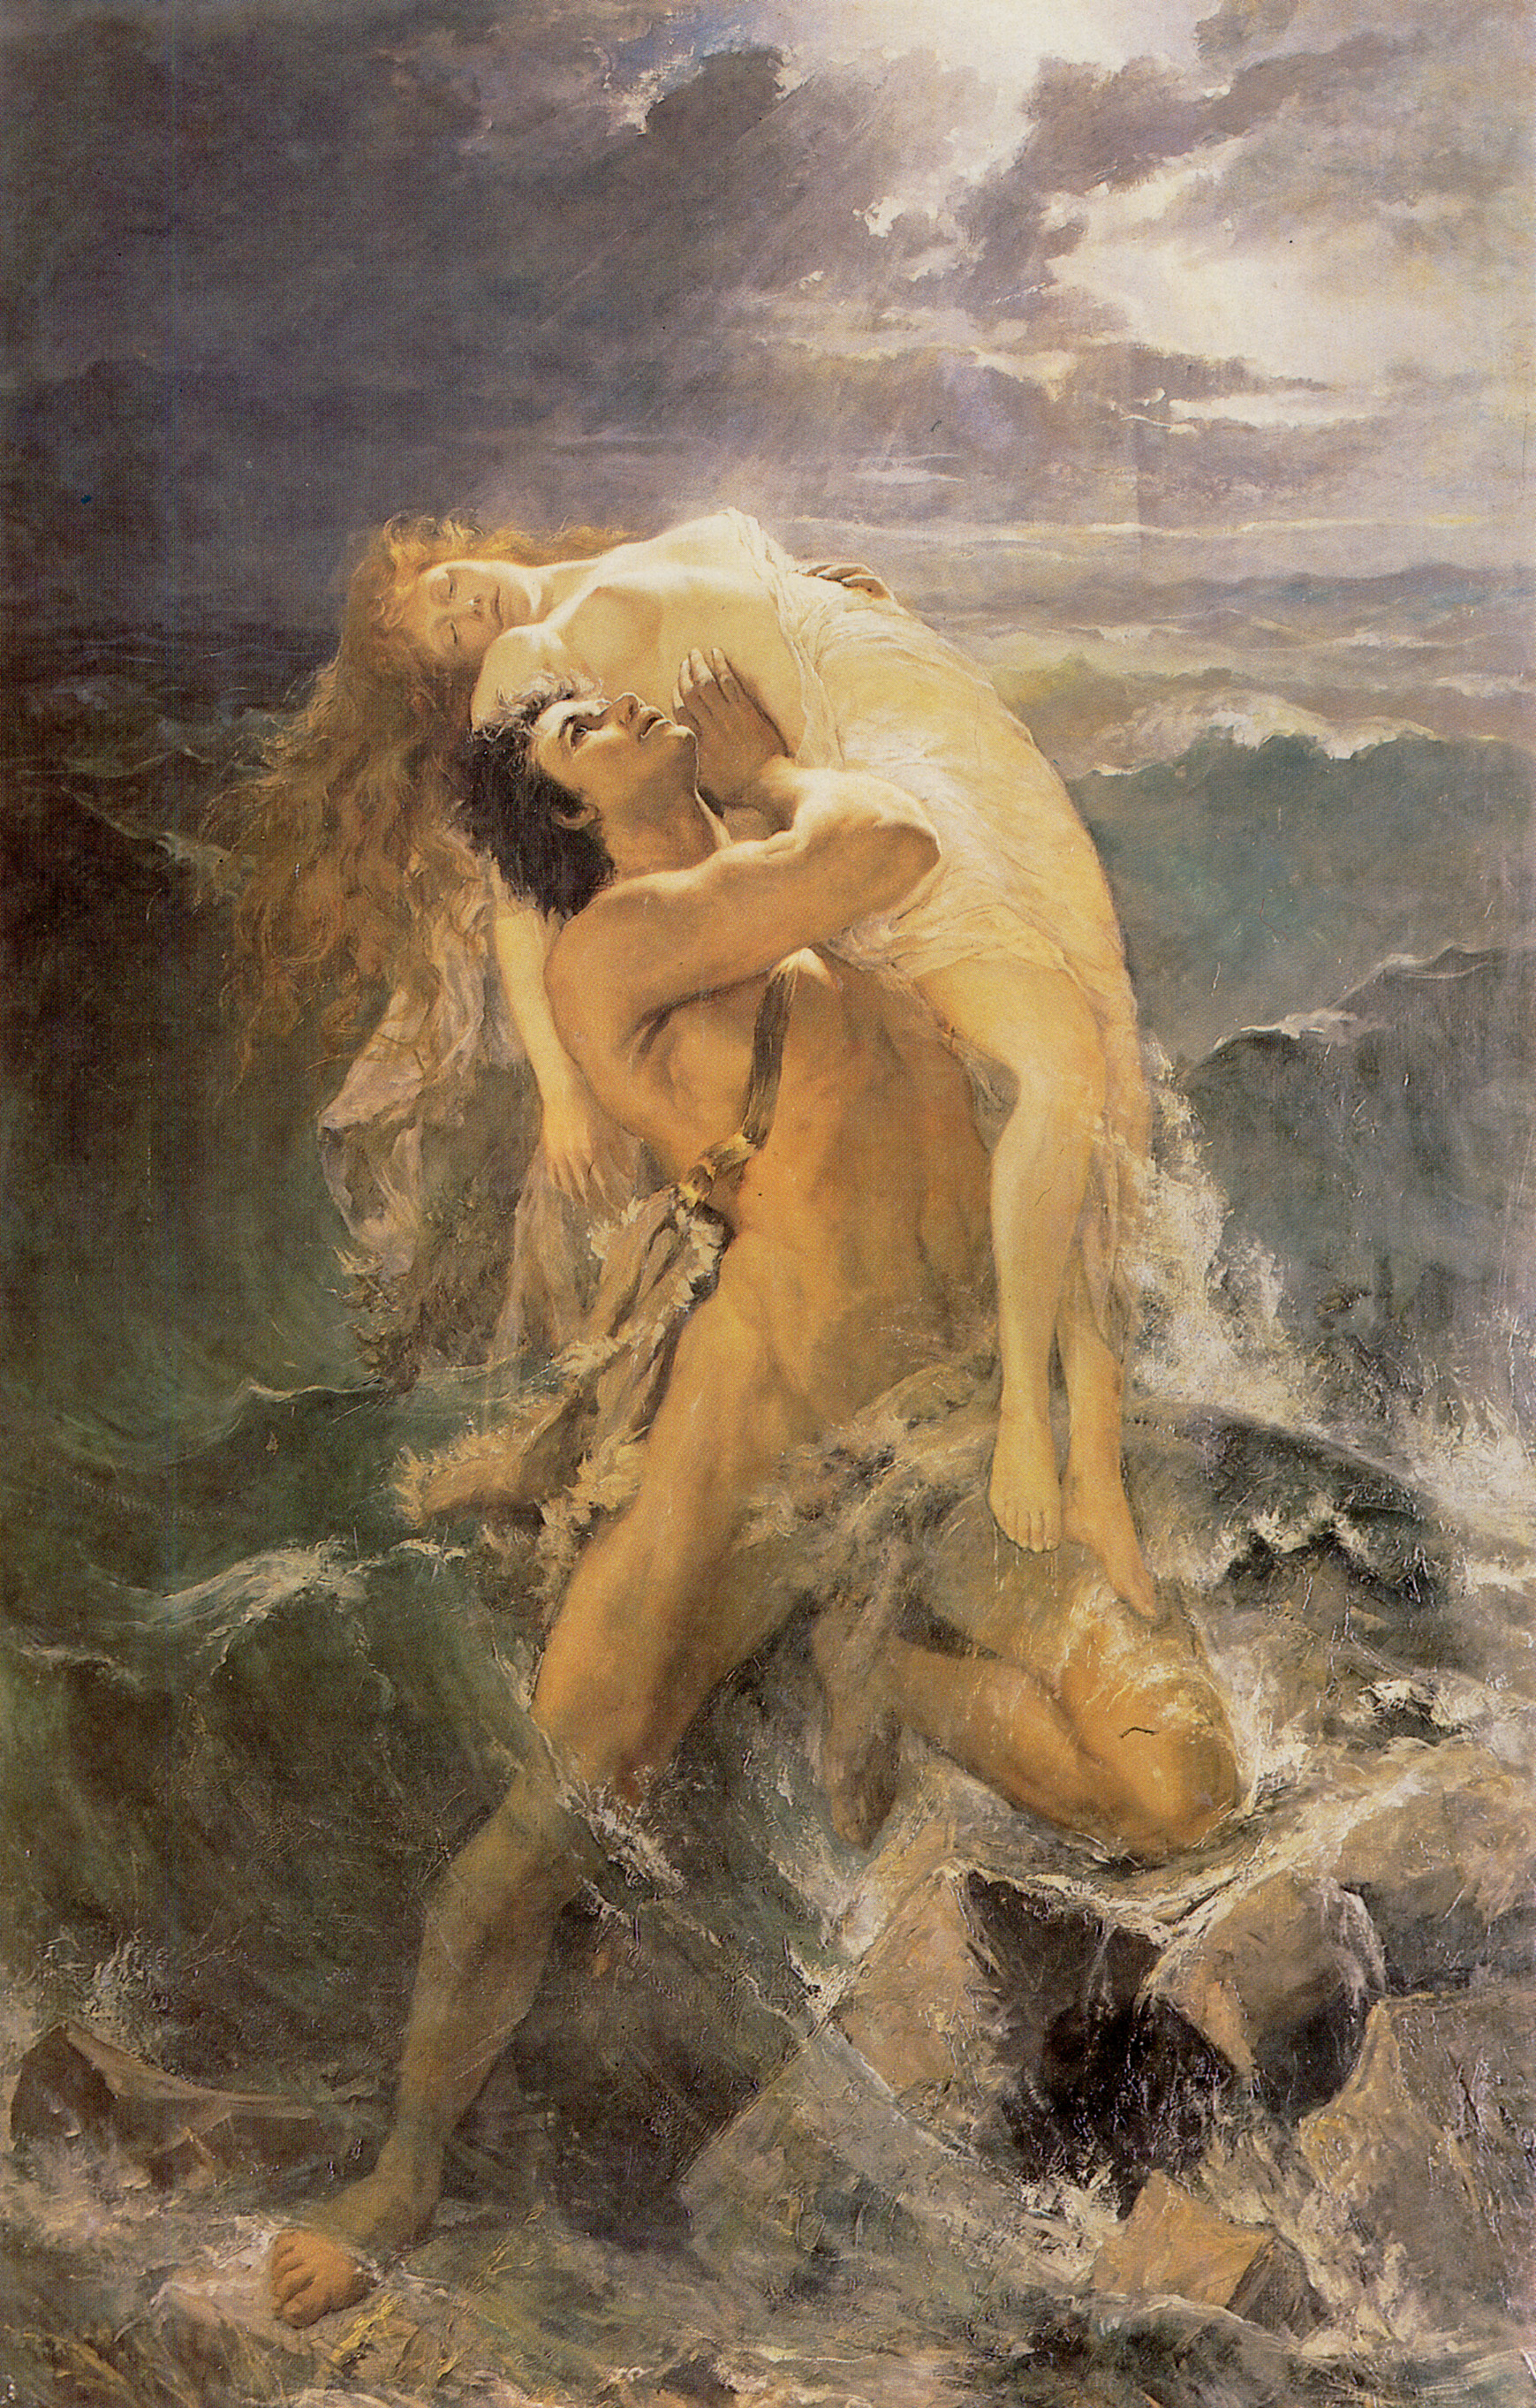 Deucalion tenant sa femme hors des flots